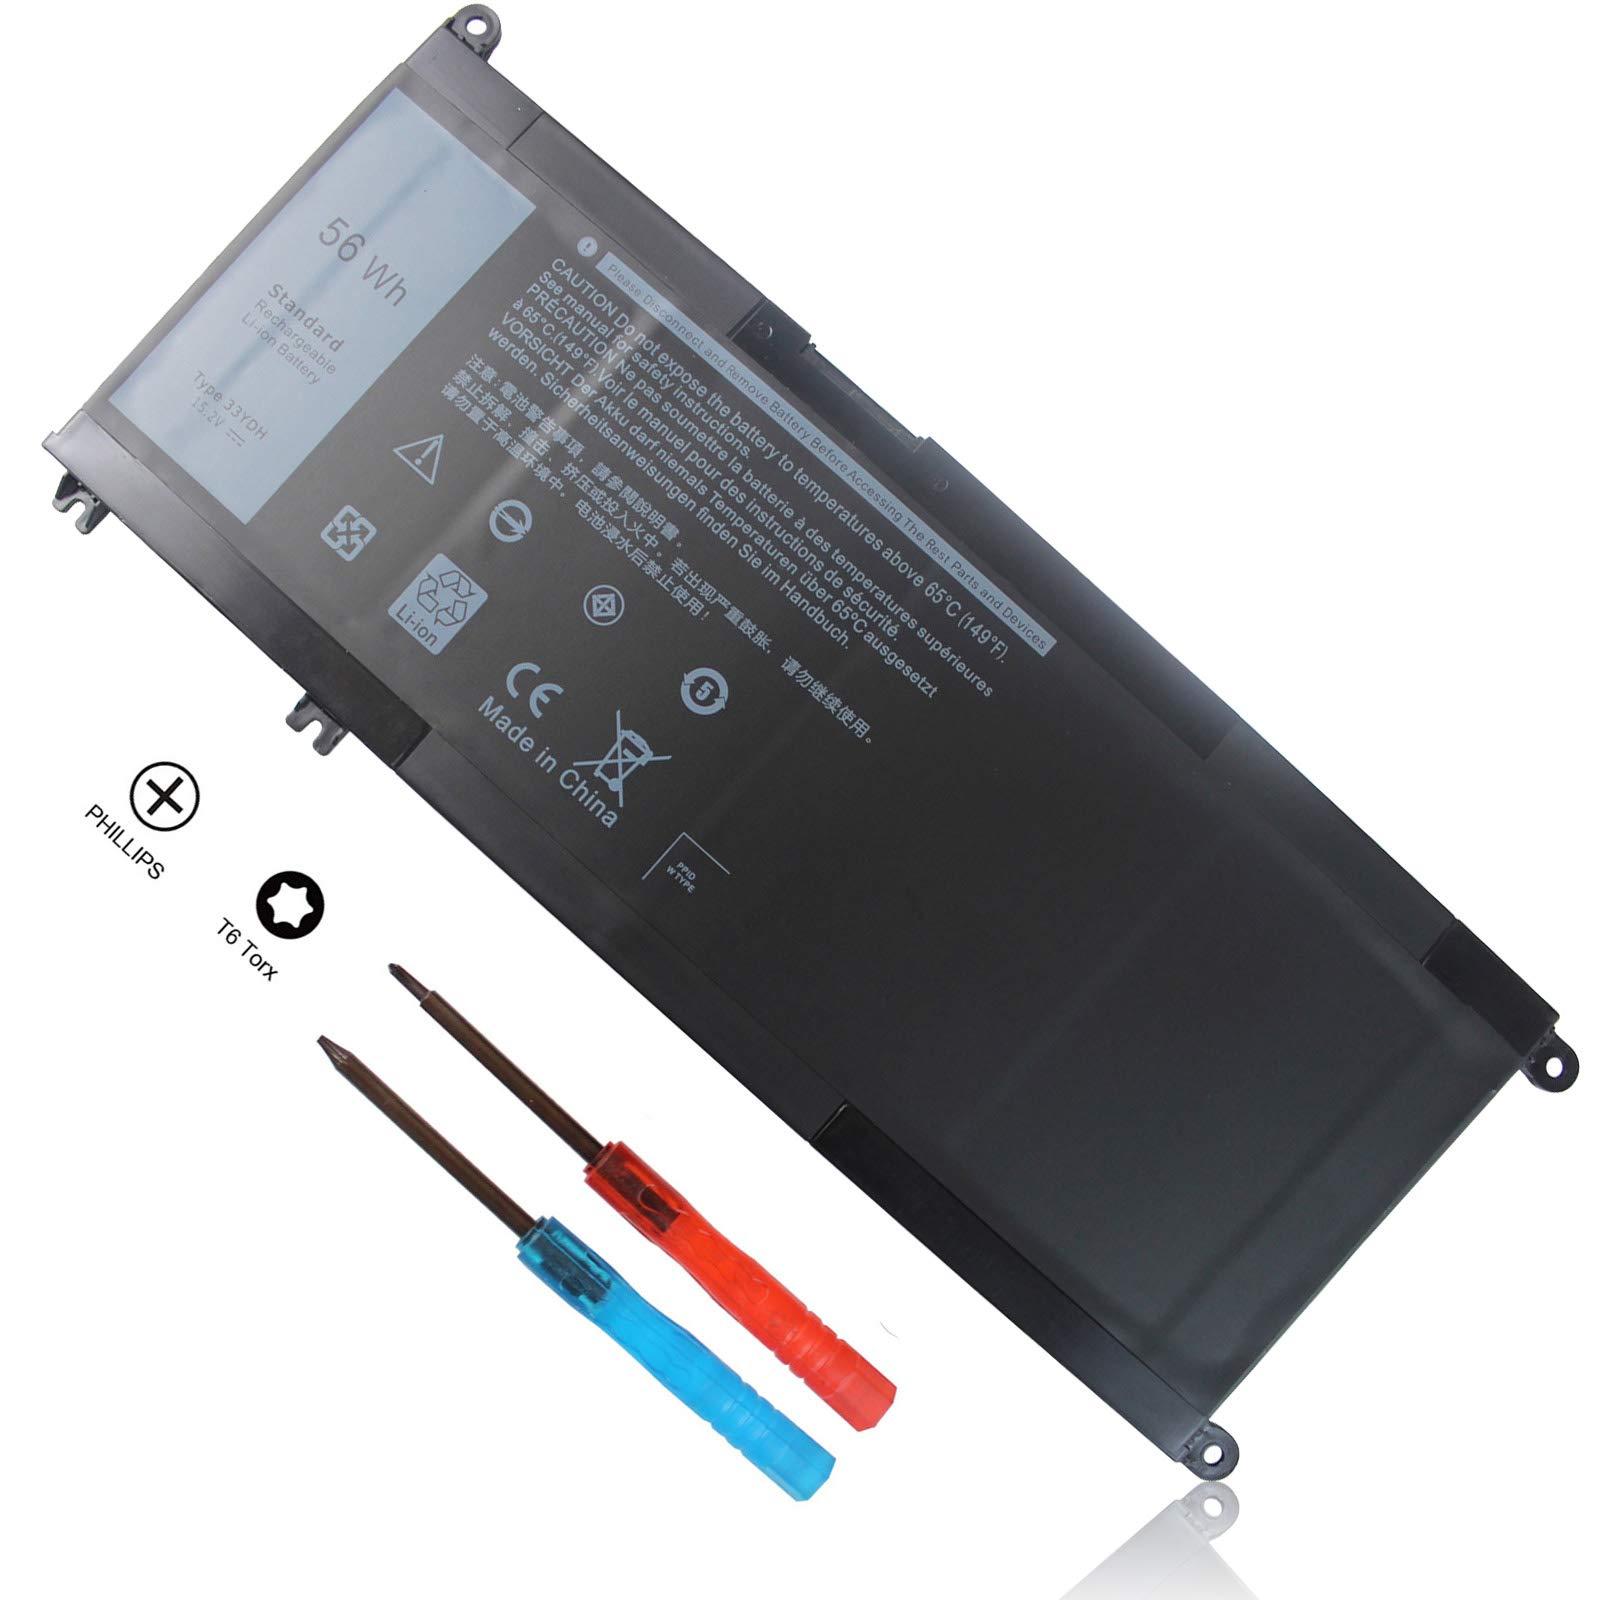 Bateria 15.2V 56Wh 33YDH Dell Inspiron 17 7000 7778 7779 778